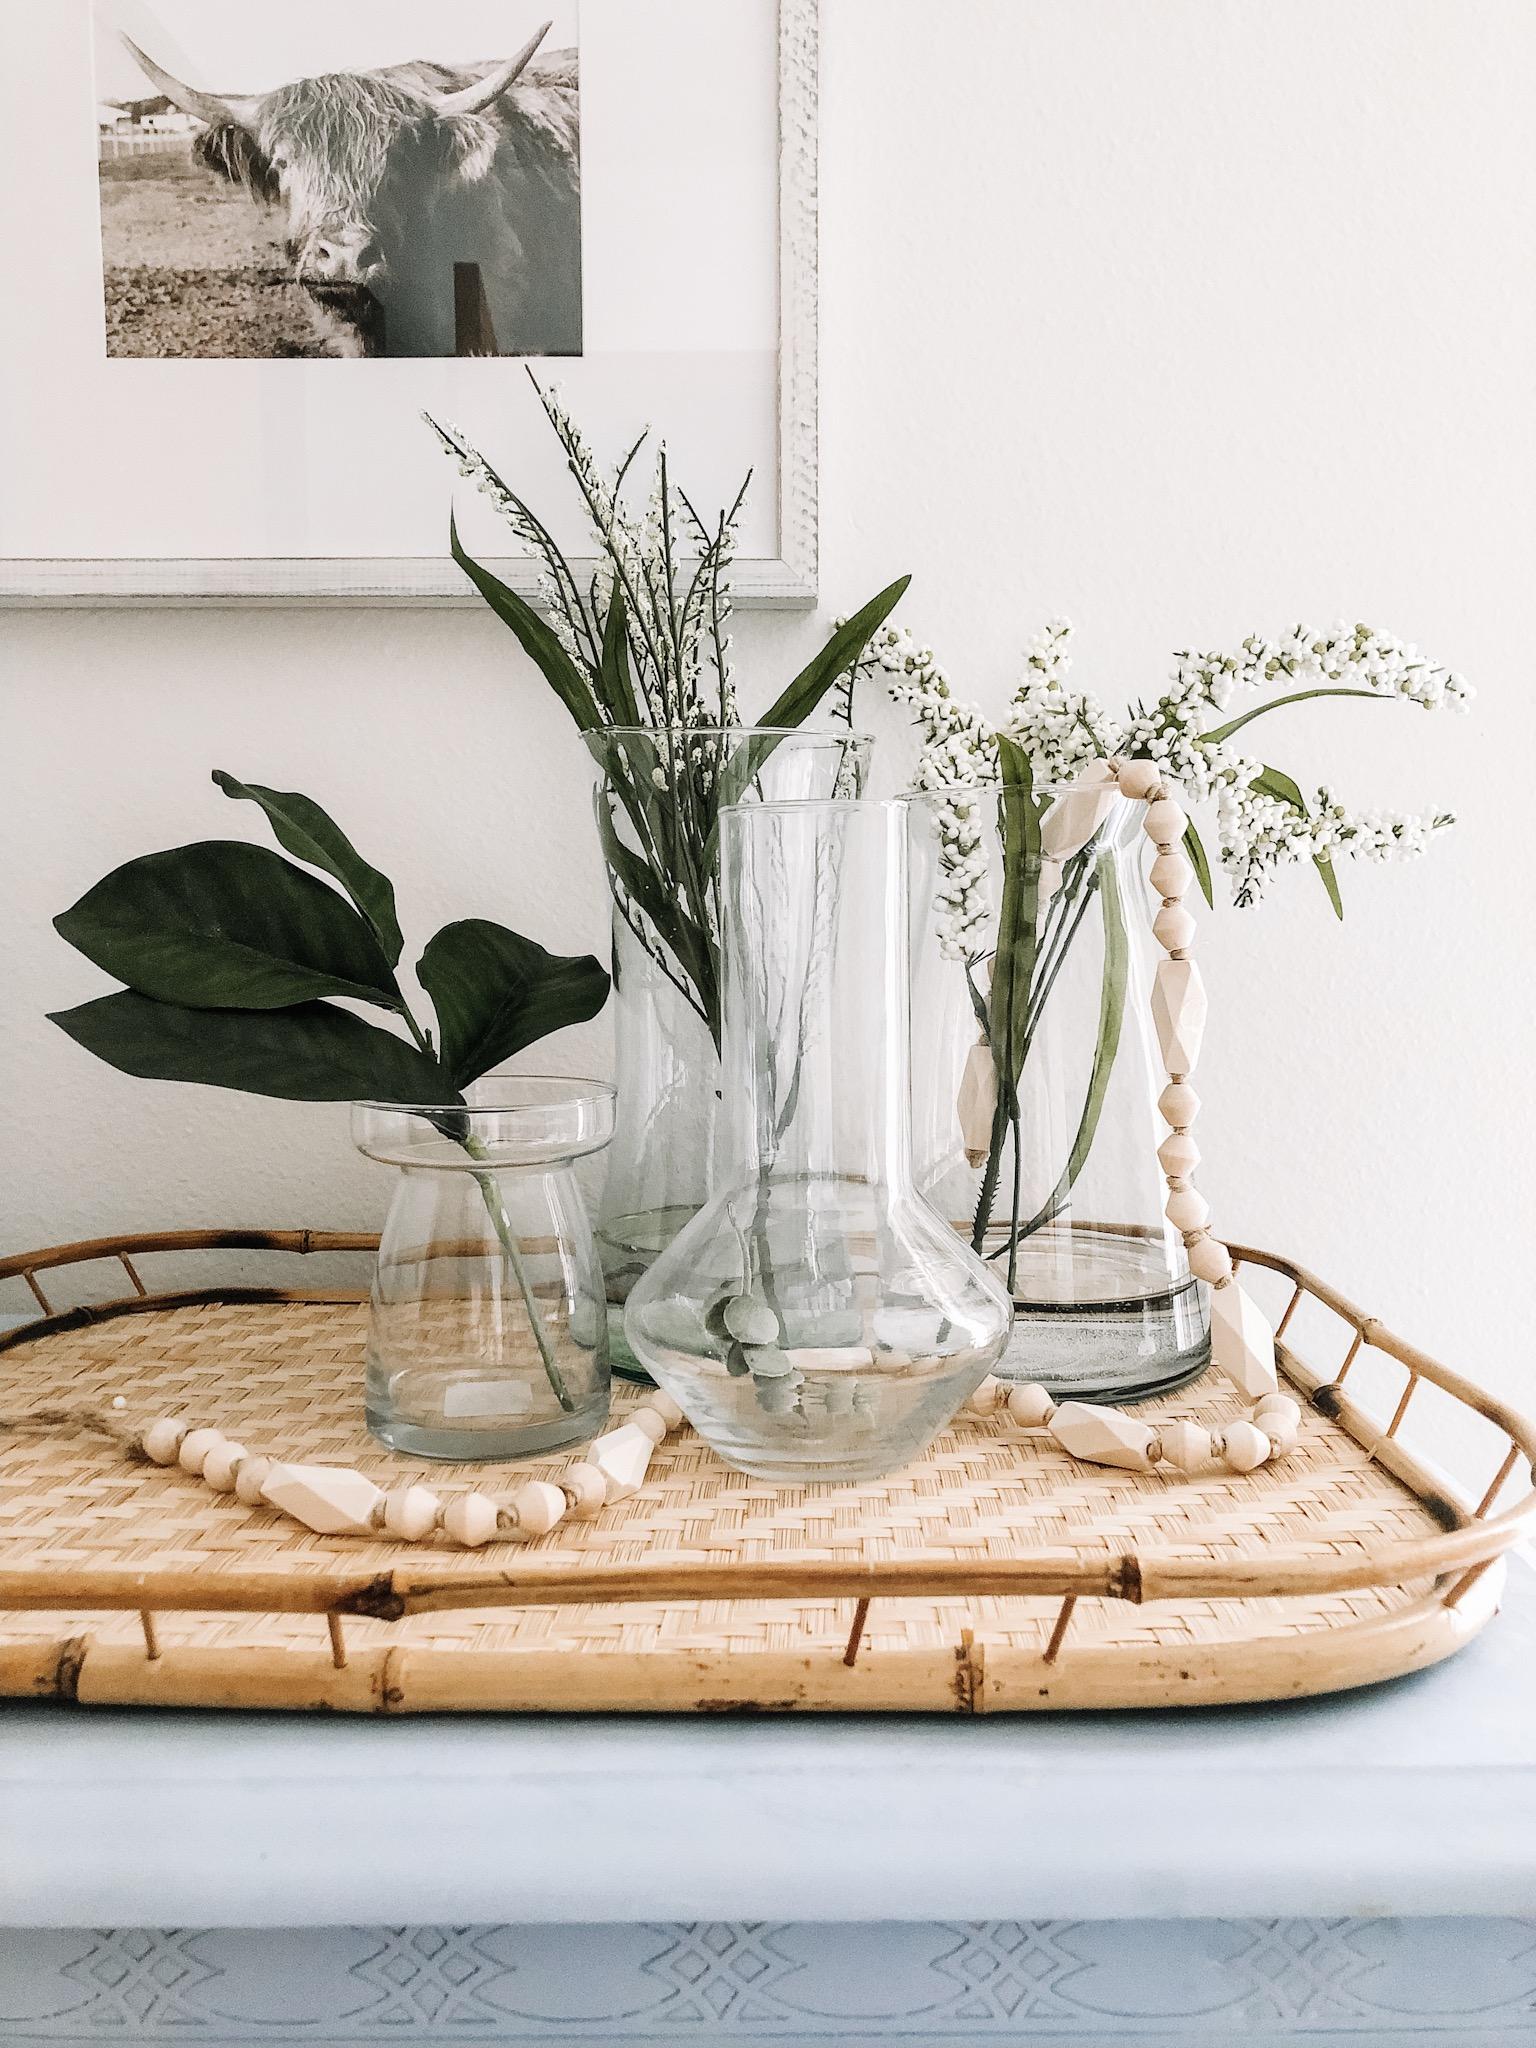 Natural, Minimal and Affordable Spring Decor